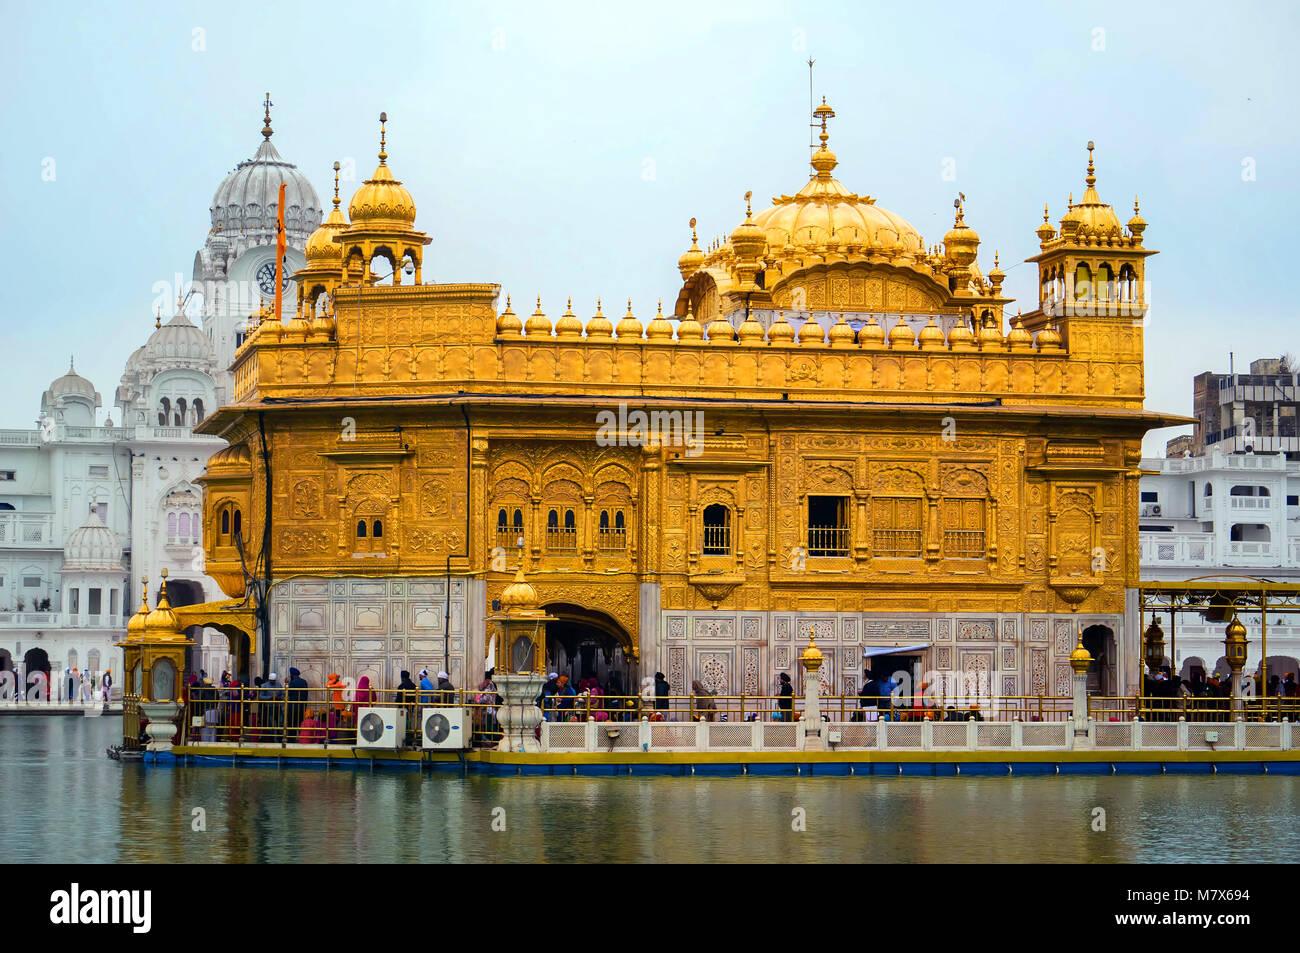 Sikh Gurdwara Stock Photos & Sikh Gurdwara Stock Images ...